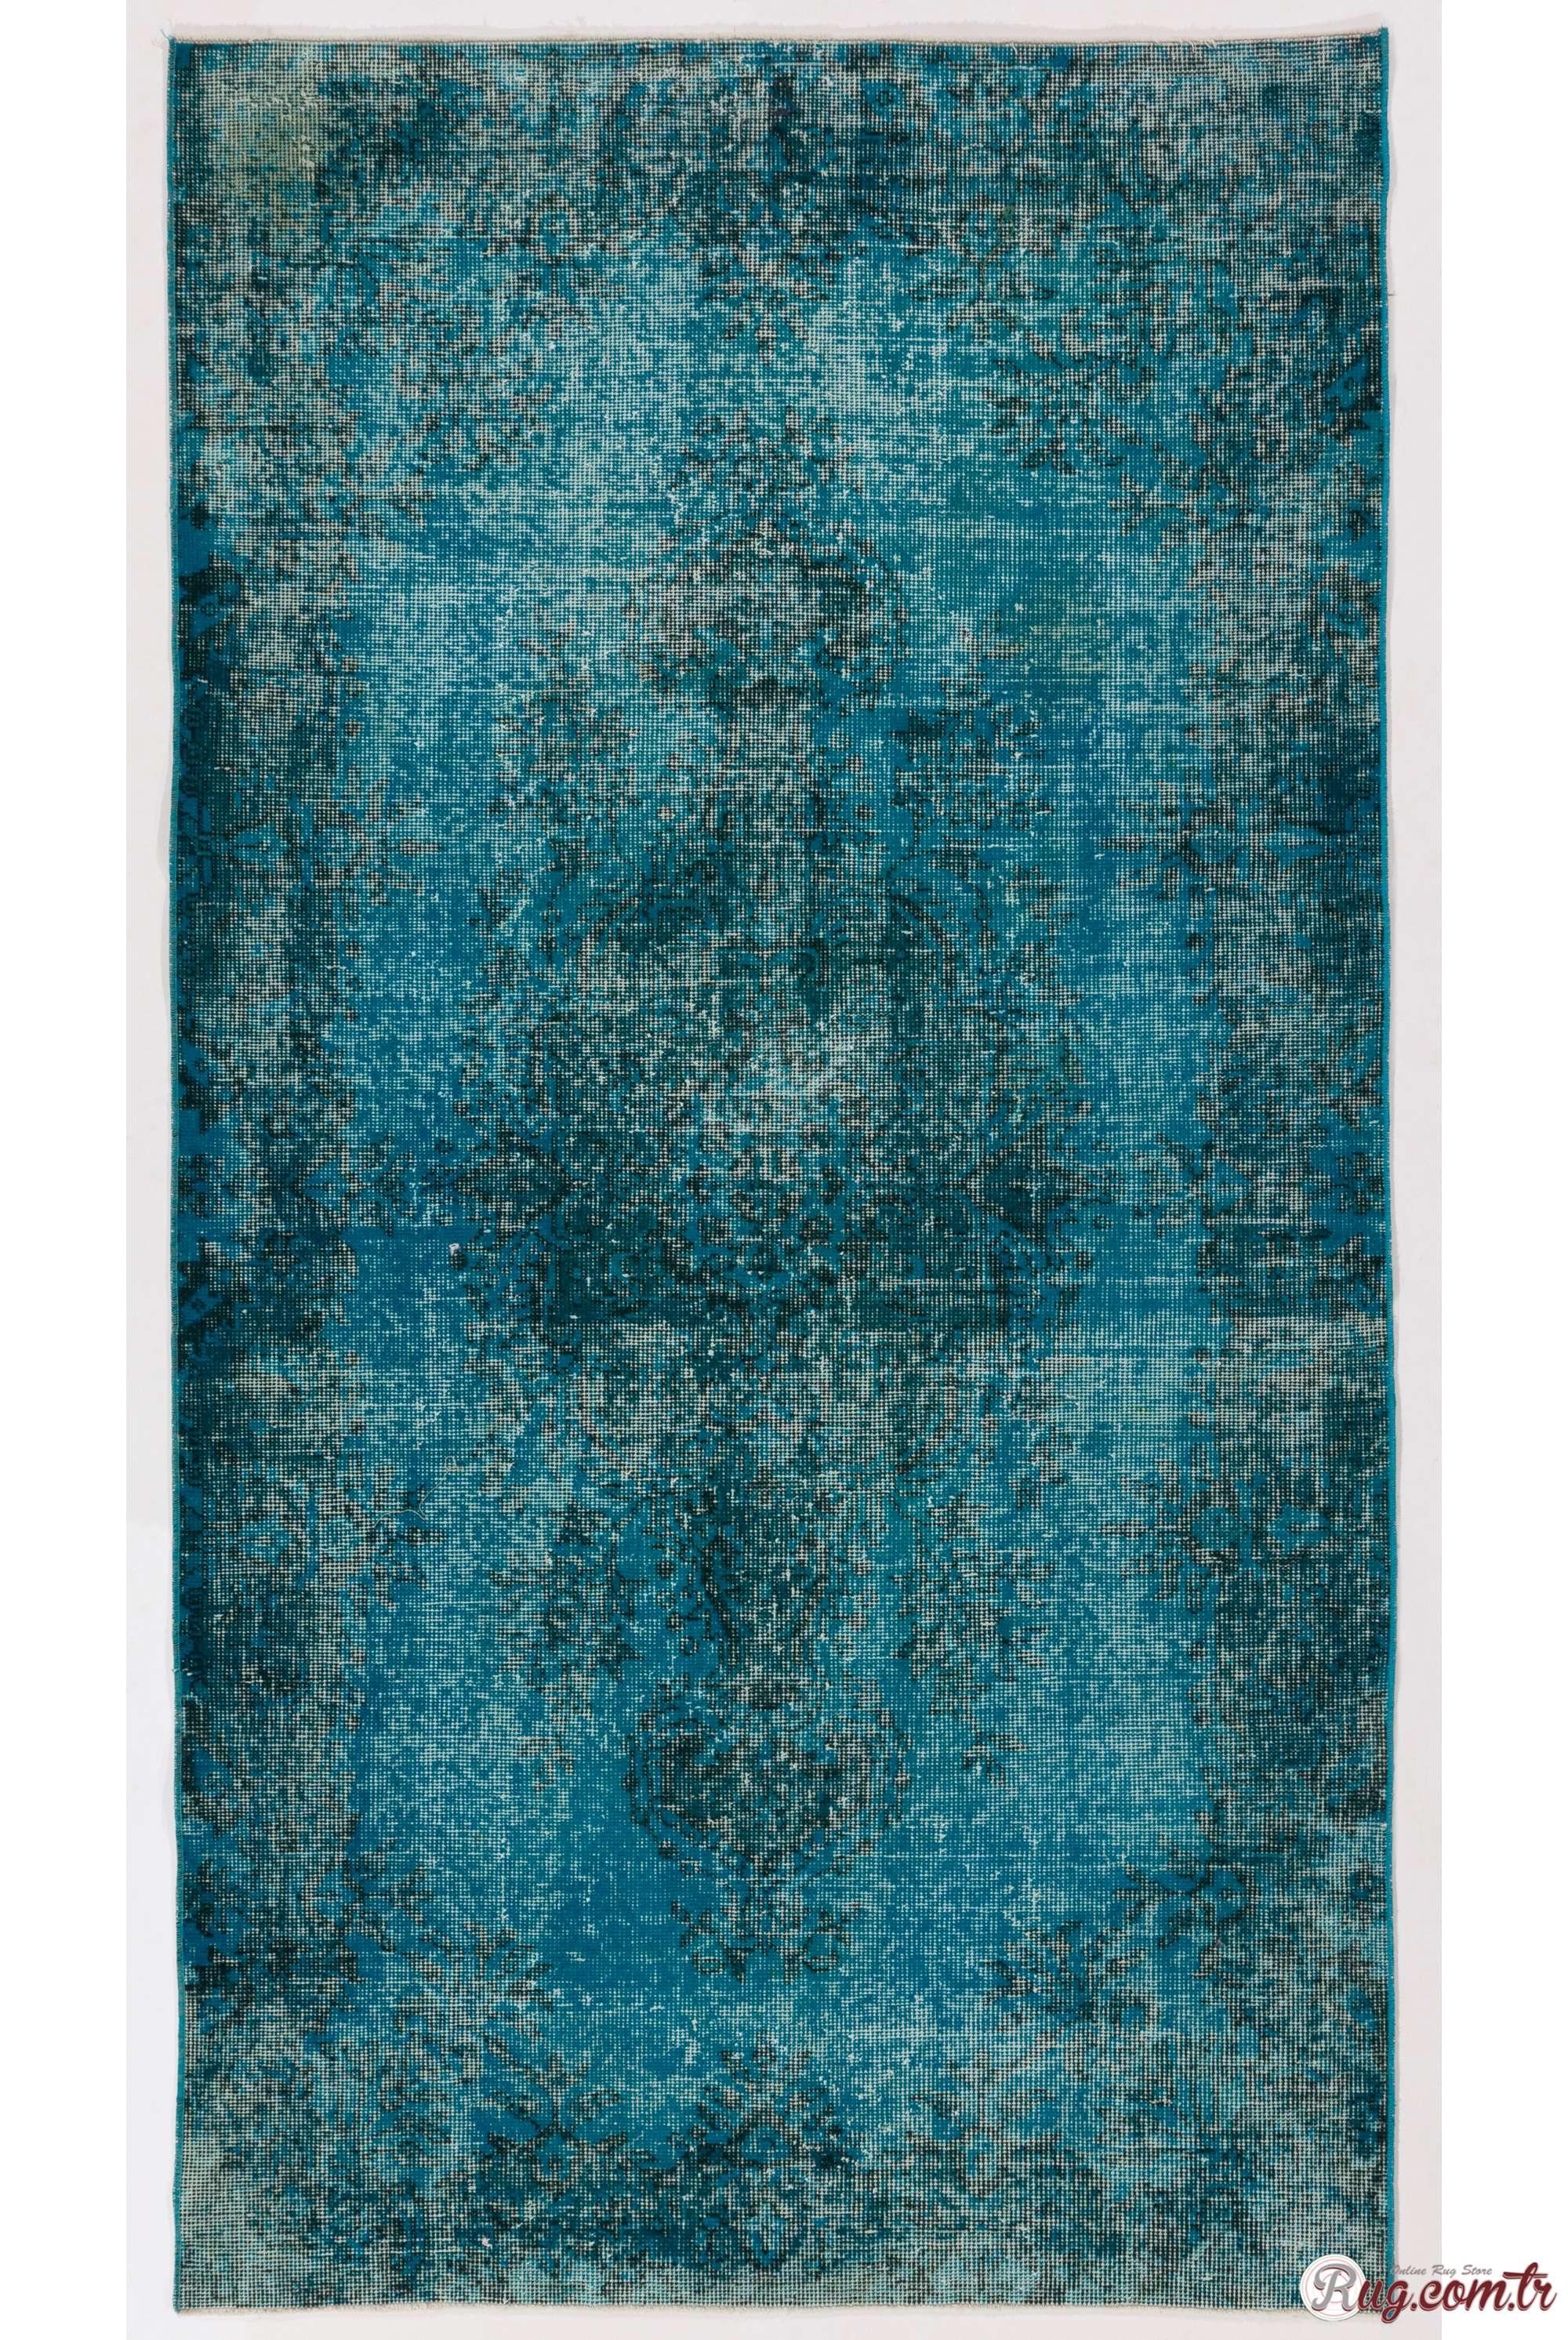 3 9 X 7 115 212 Cm Bondi Blue Color Vintage Overdyed Handmade Turkish Rug